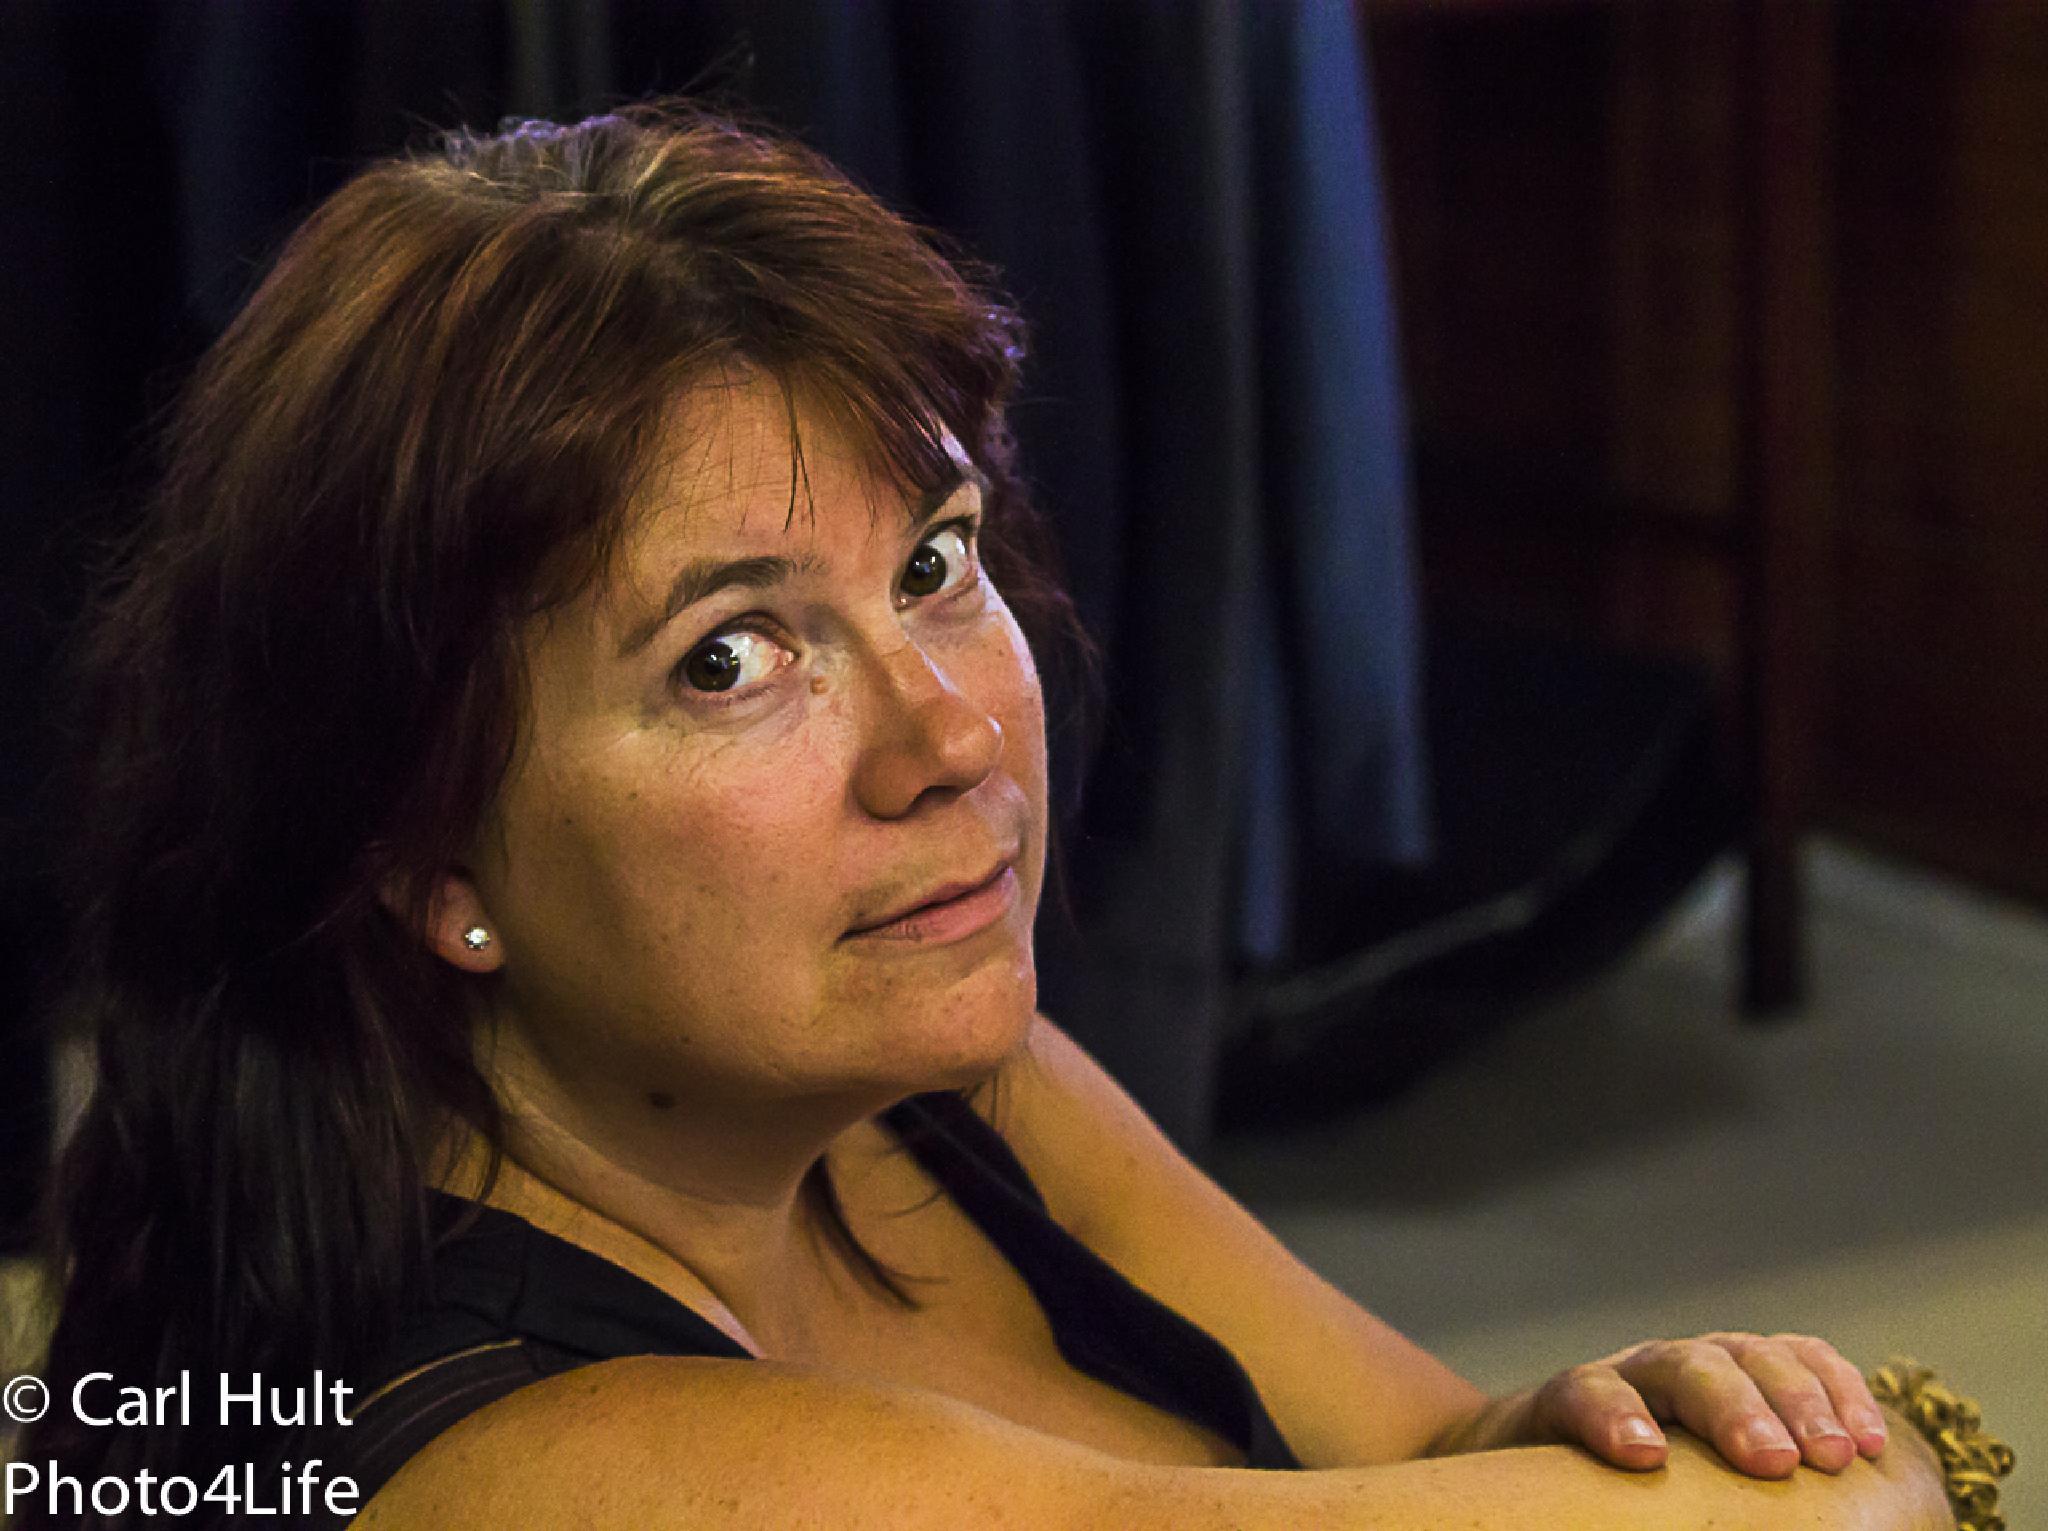 Susanne portrait by Carl Hult